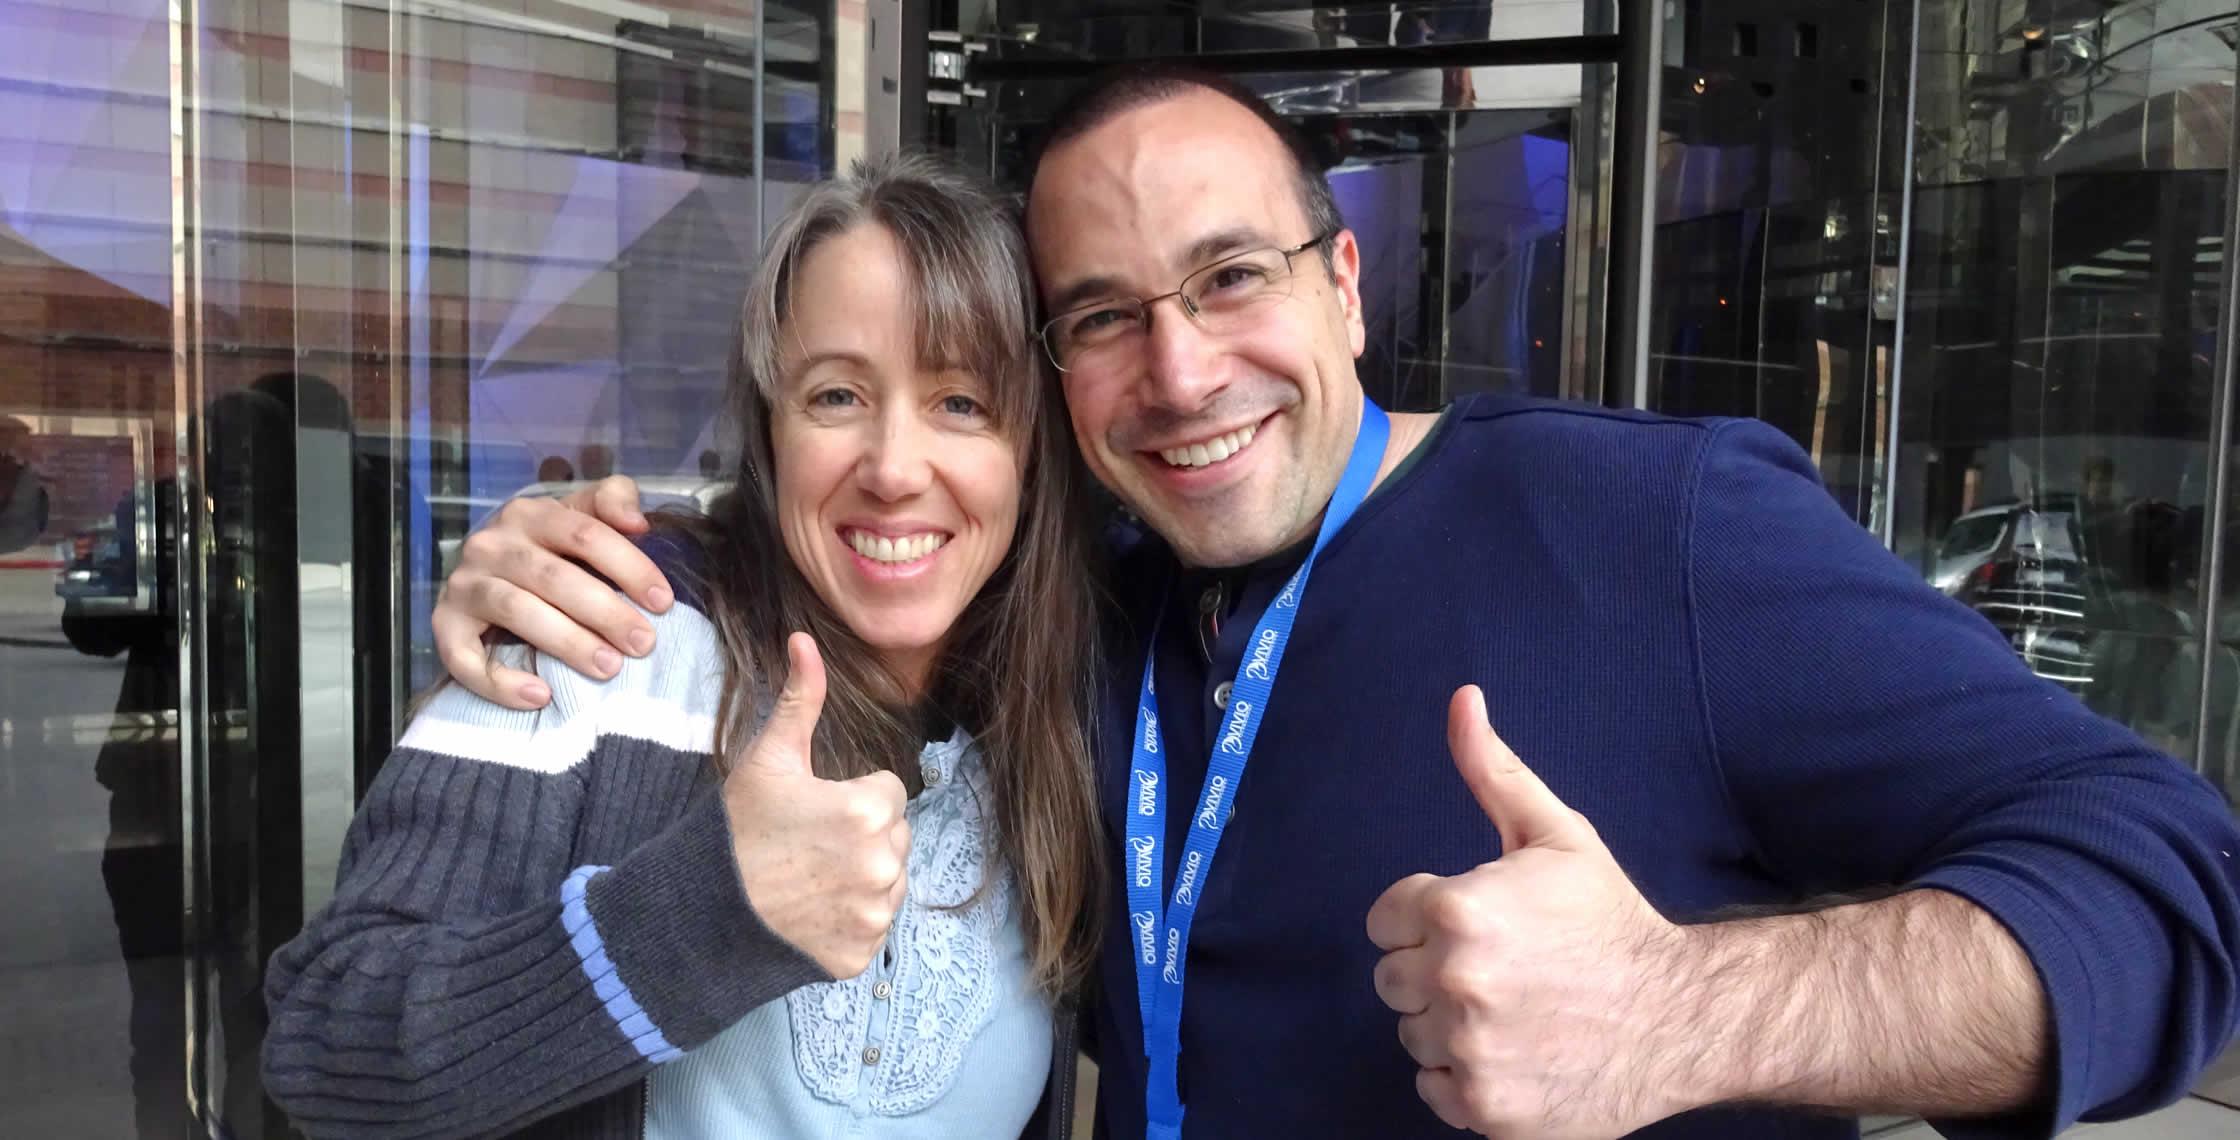 Ben Nadel at cf.Objective() 2014 (Bloomington, MN) with: Kitt Hodsden